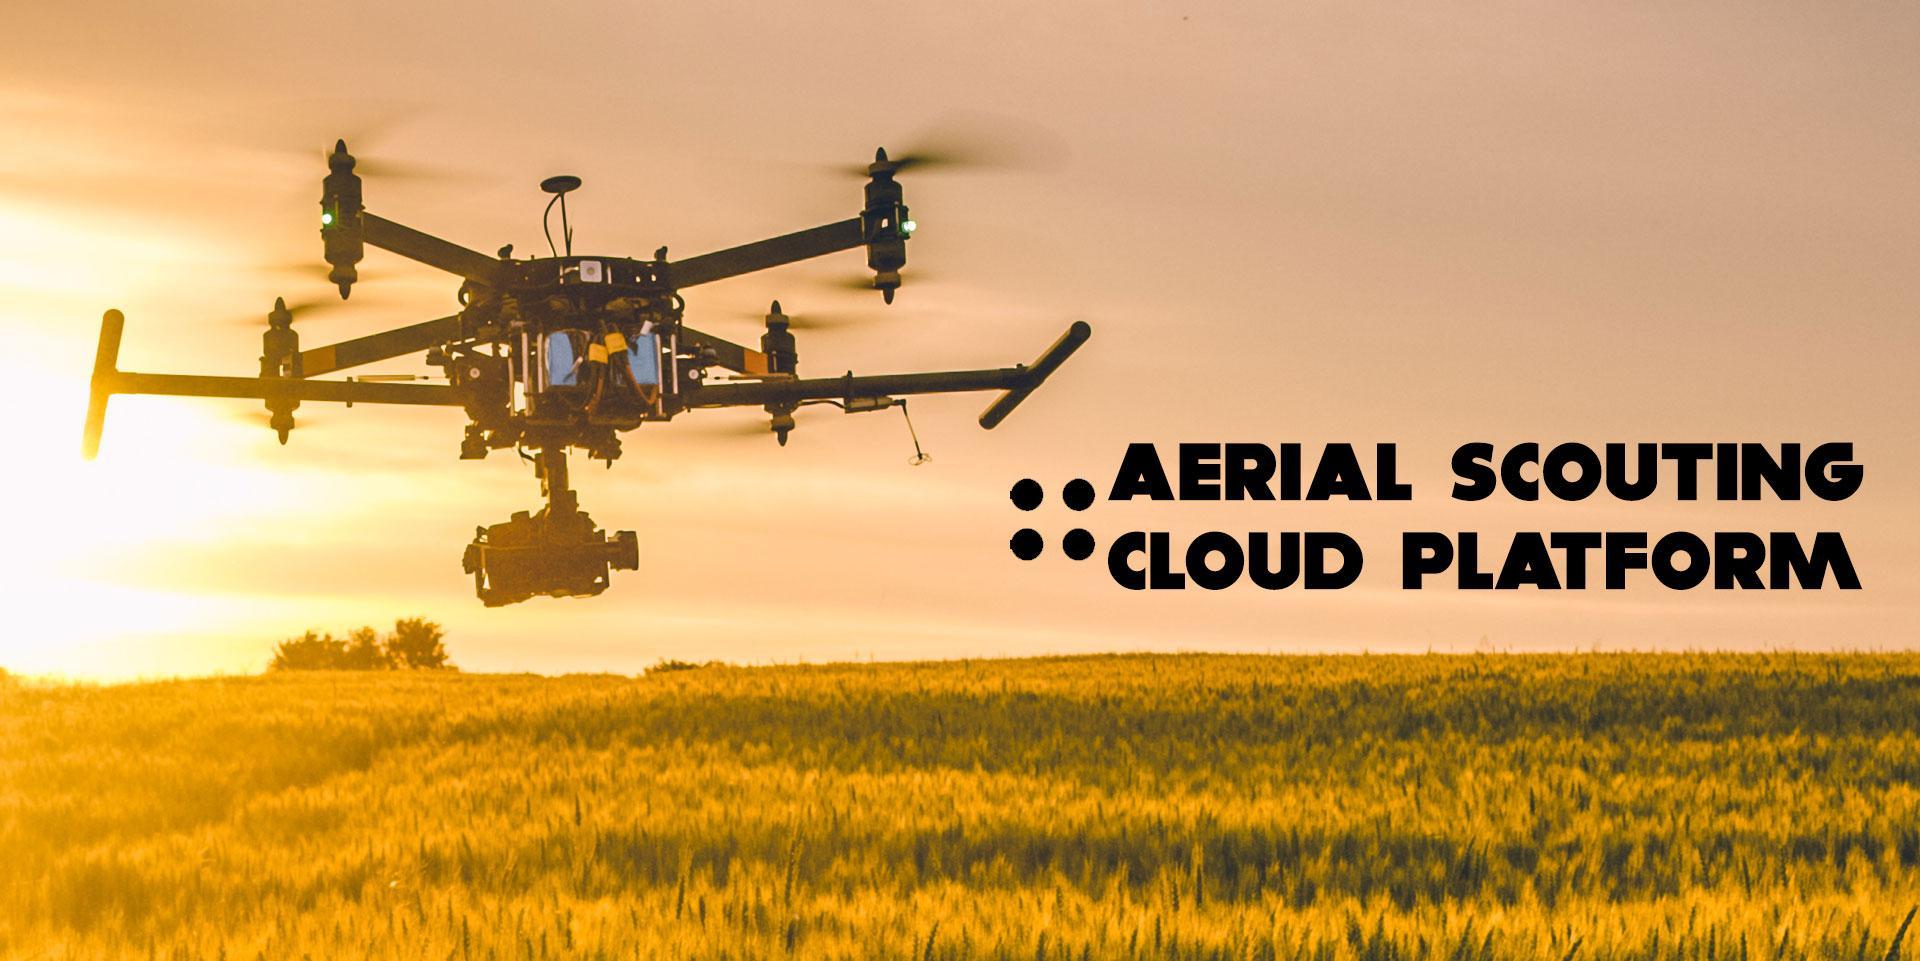 Aerial Scouting Cloud Platform